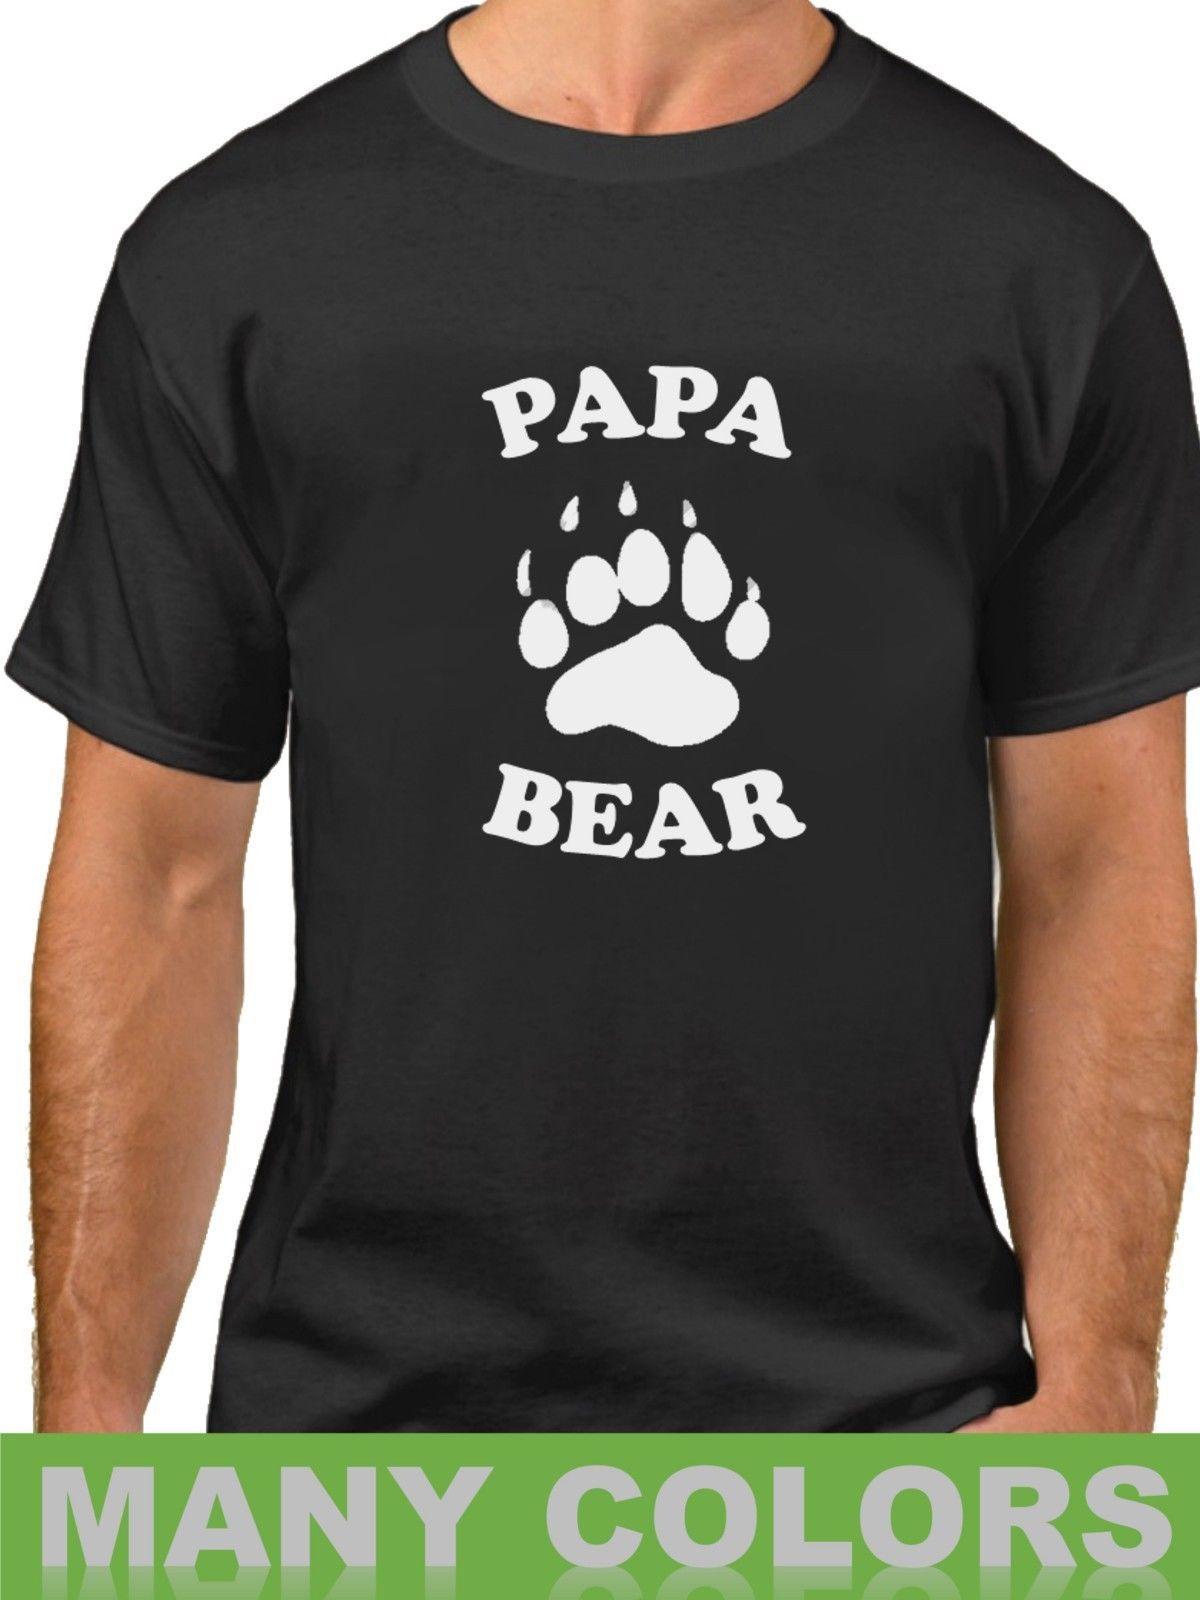 b37a5a0ba Papa Bear Funny T Shirt Birthday Present For Dad Tshirt Gift For Him Fathers  Day Print Fitness T Shirt Men Classic Casual T Shirt Fun T Shirts Online  Shirts ...